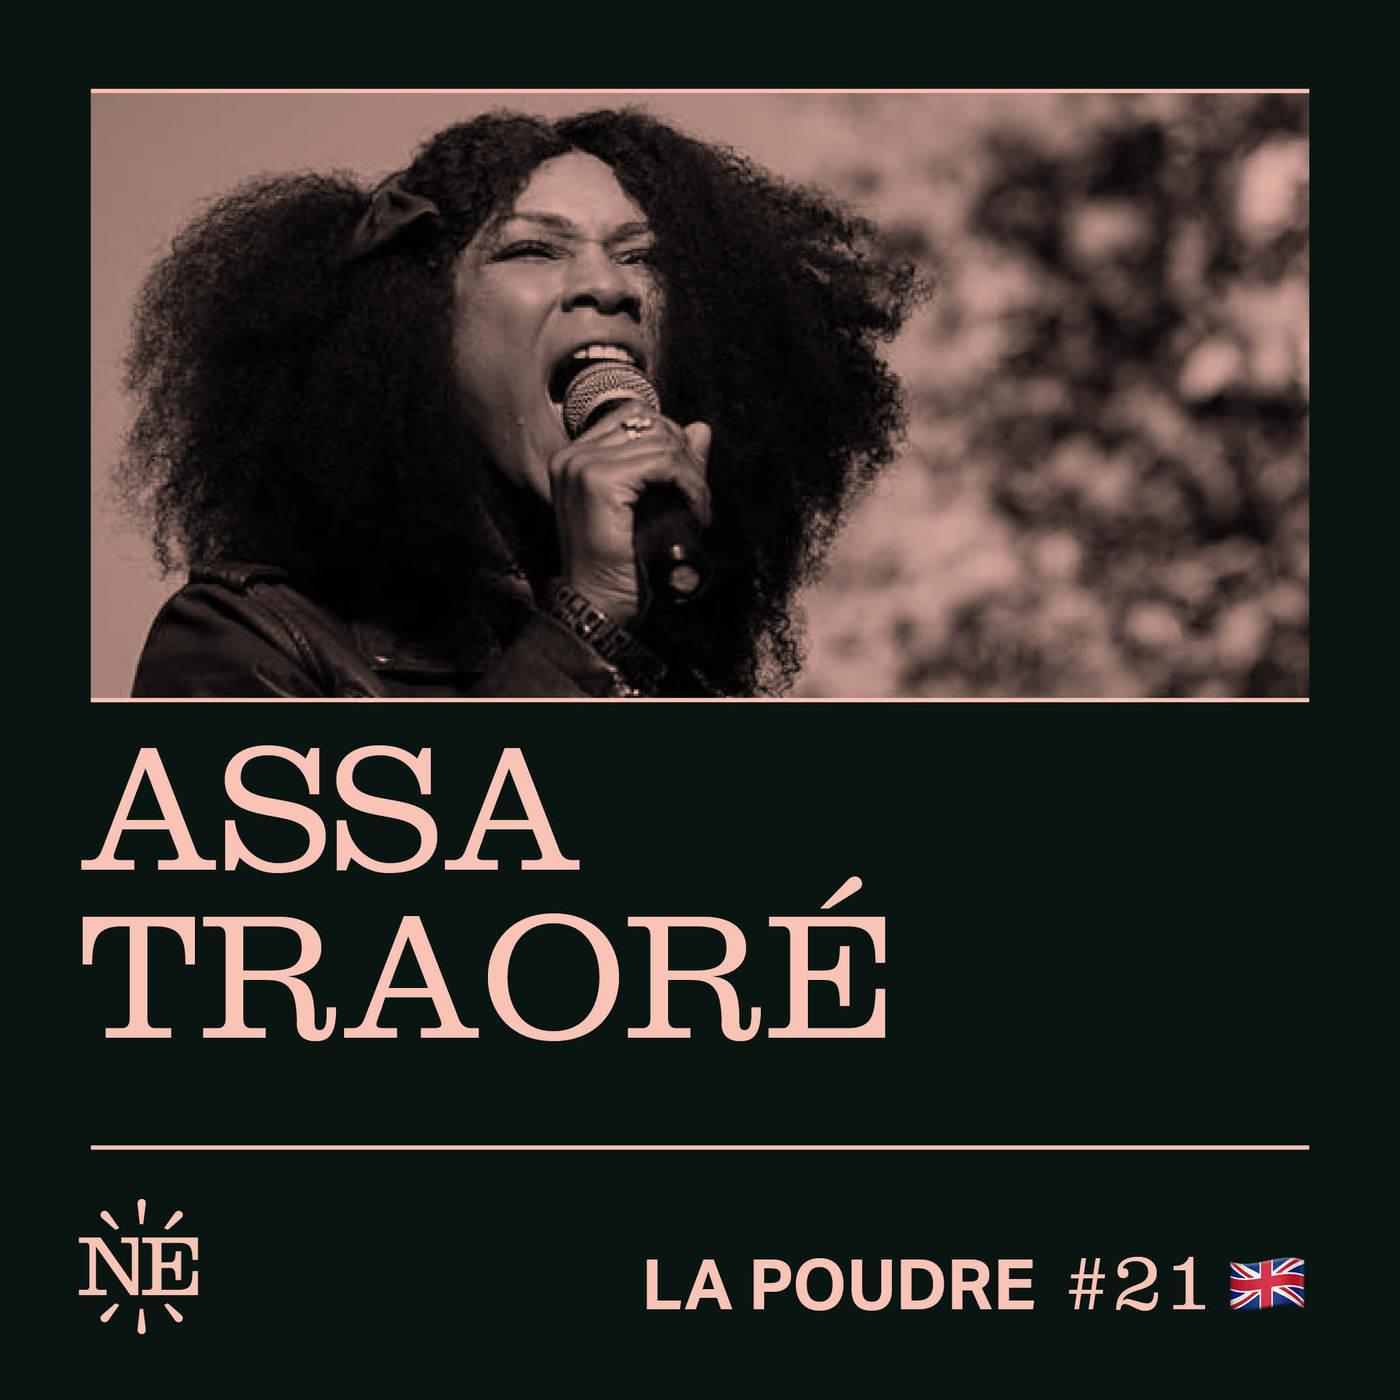 Episode 21 - Assa Traoré - 🇬🇧